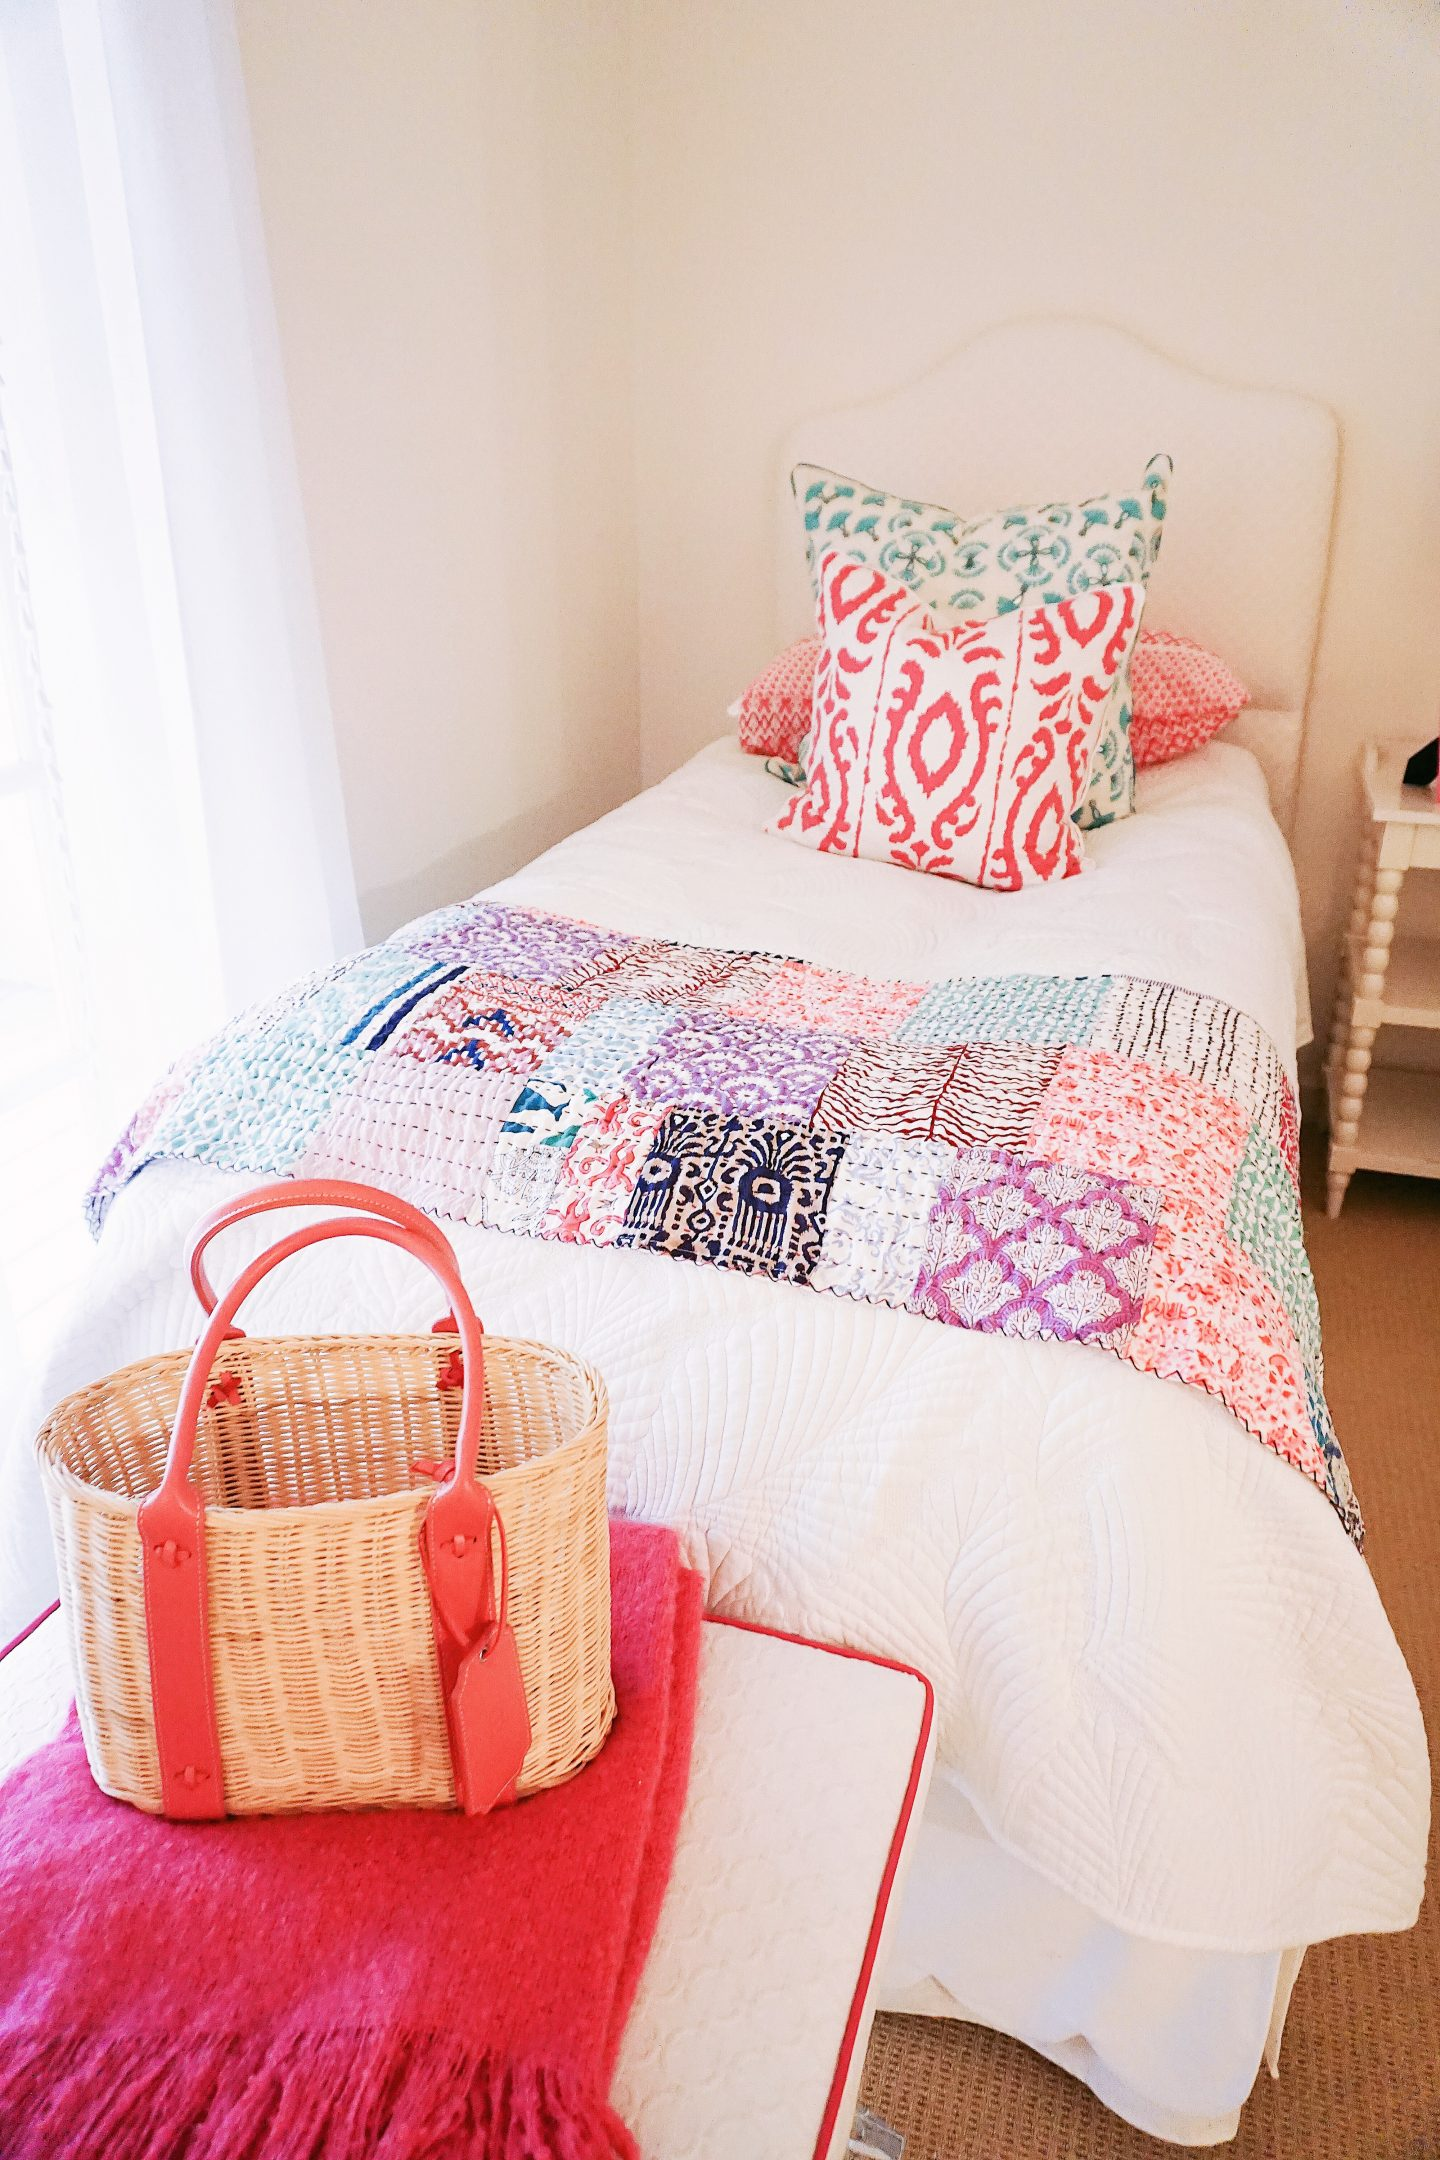 Vero Beach Townhouse bed